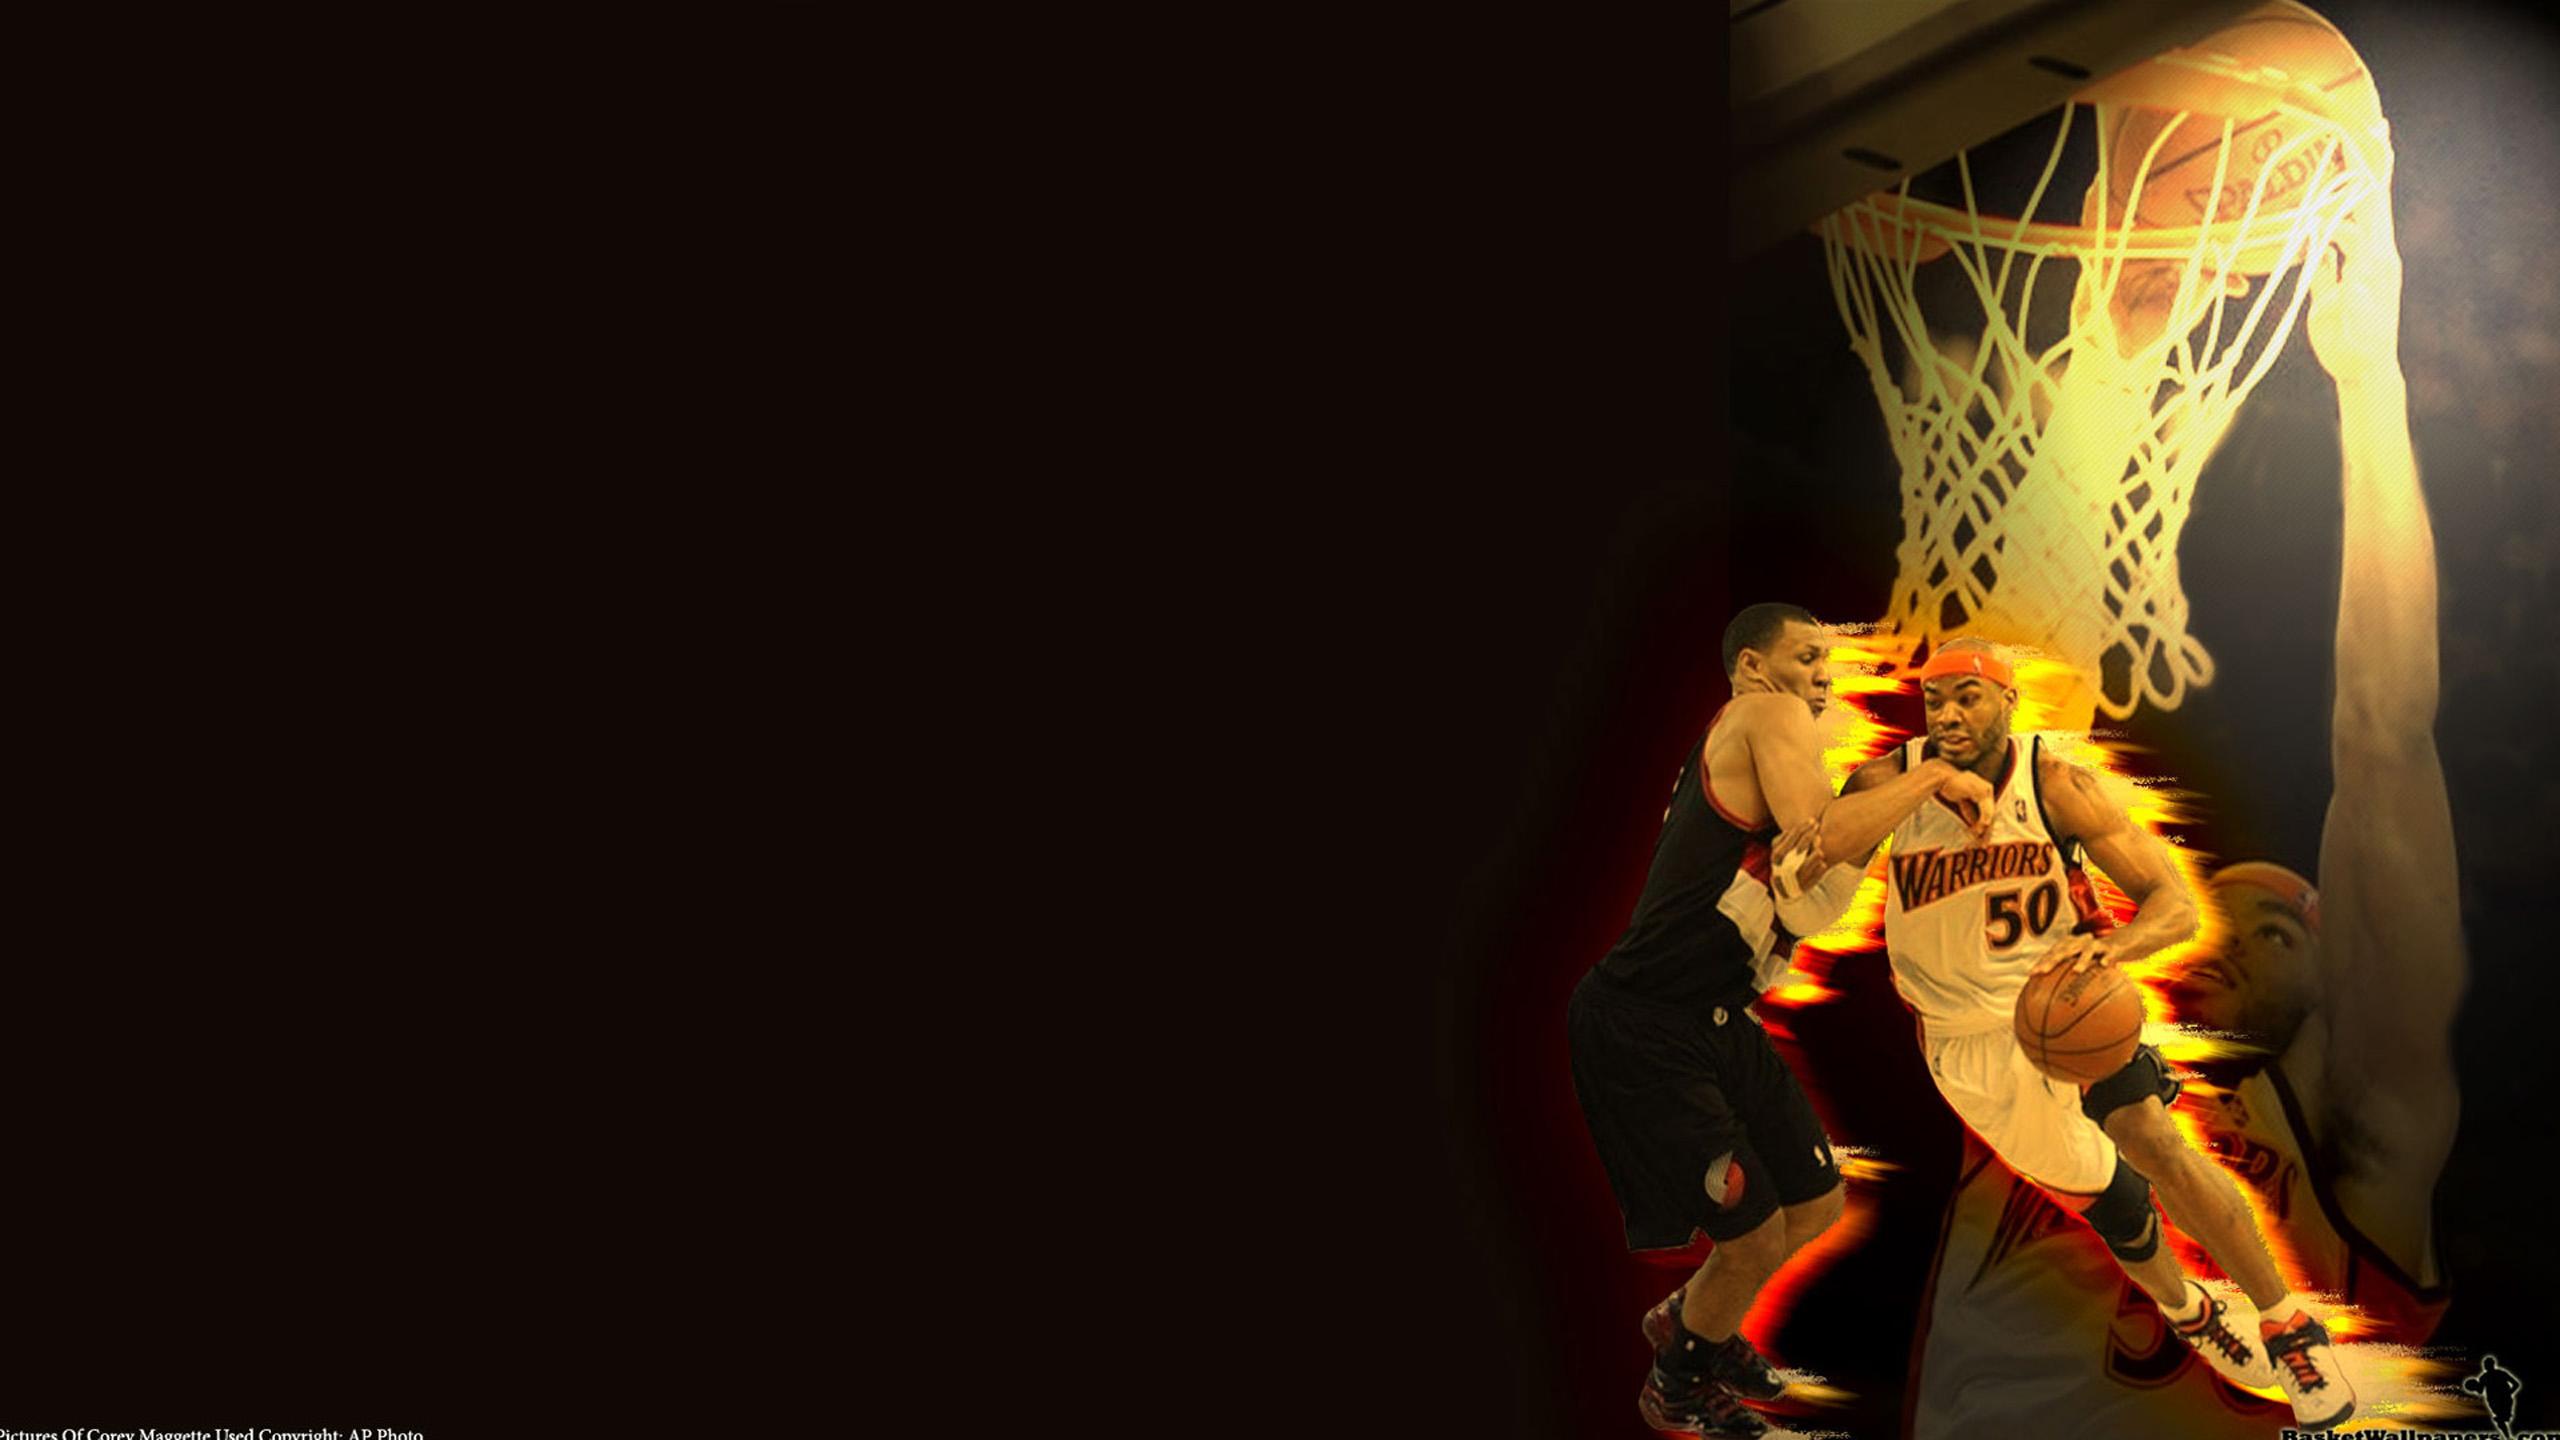 Basketball wallpapaer - Cool basketball wallpapers hd ...